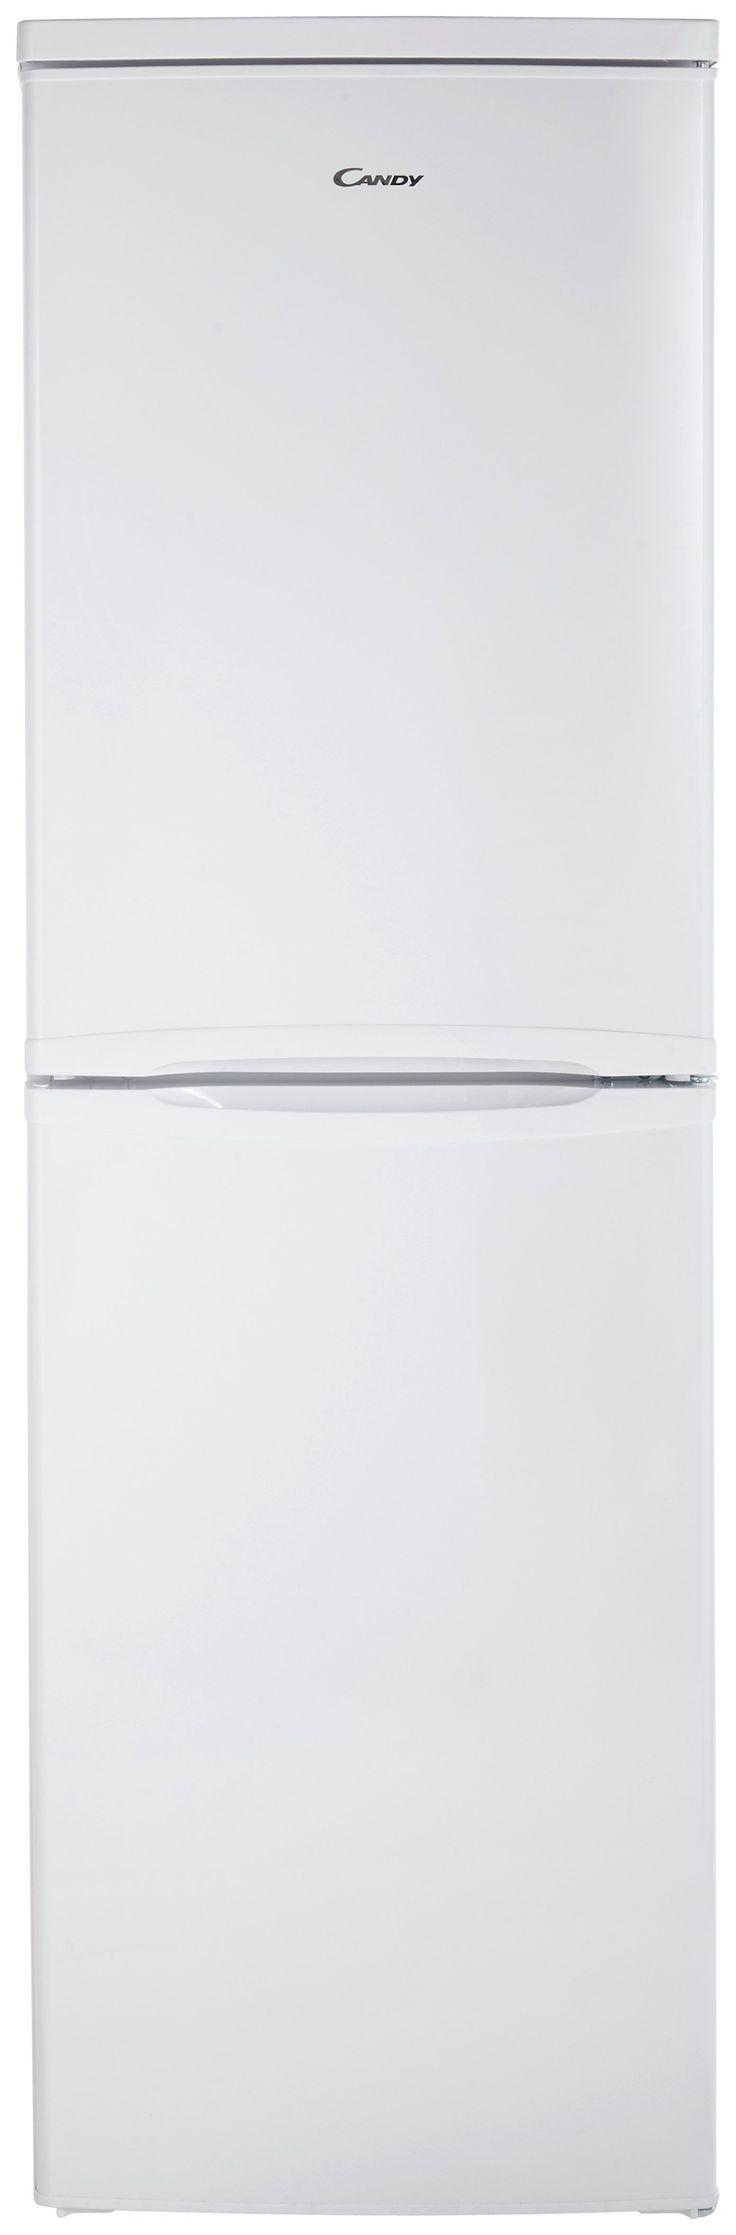 Buy Candy CSC1745SE Tall Fridge Freezer - Silver at Argos.co.uk, visit Argos.co.uk to shop online for Fridge freezers, Large kitchen appliances, Home and garden